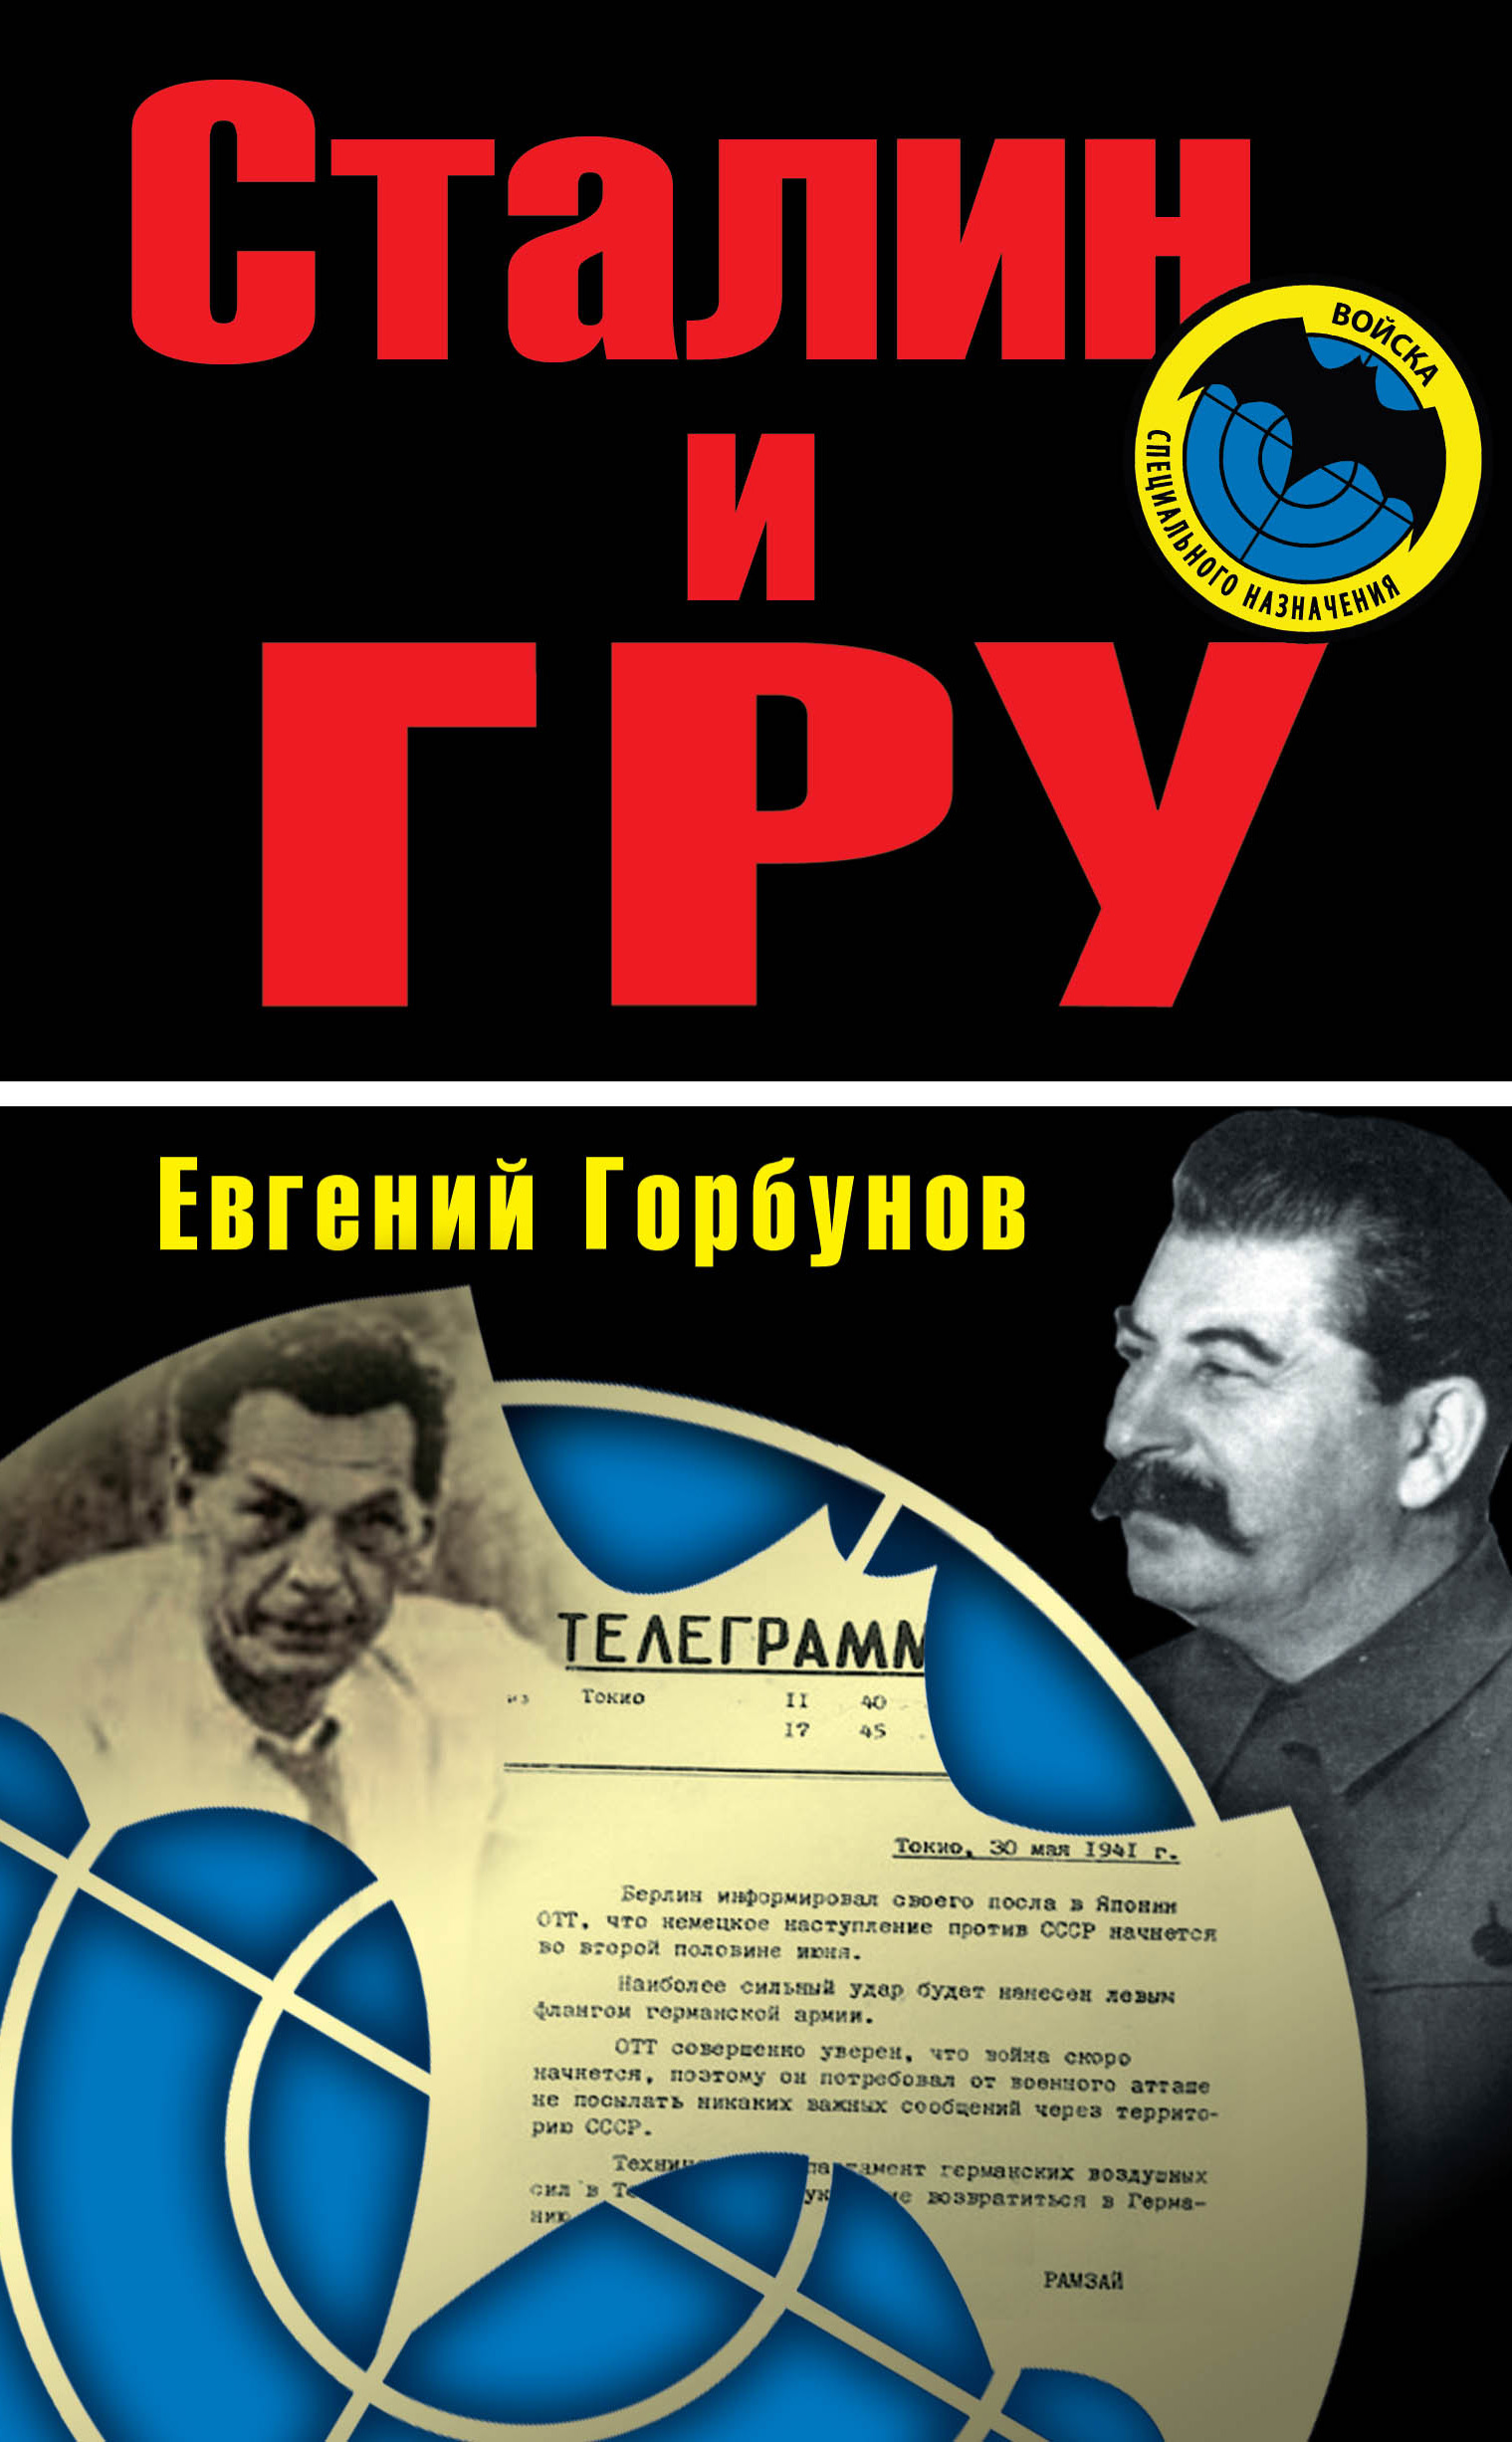 Сталин и ГРУ